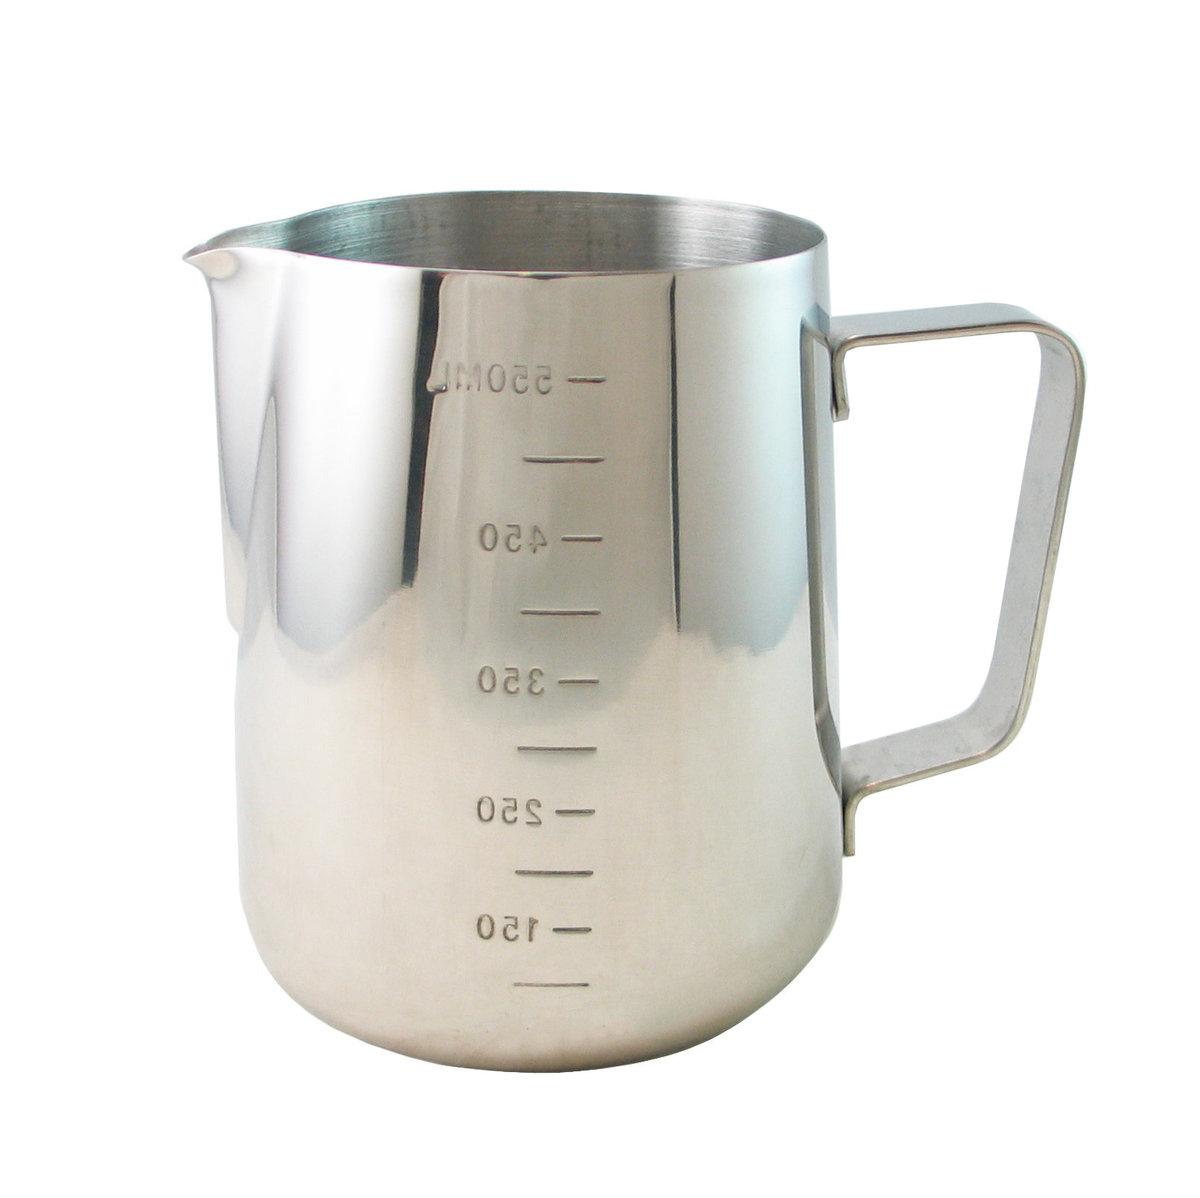 Stainless Steel Coffee Milk Jug Milk Frothing Pitcher 550mL